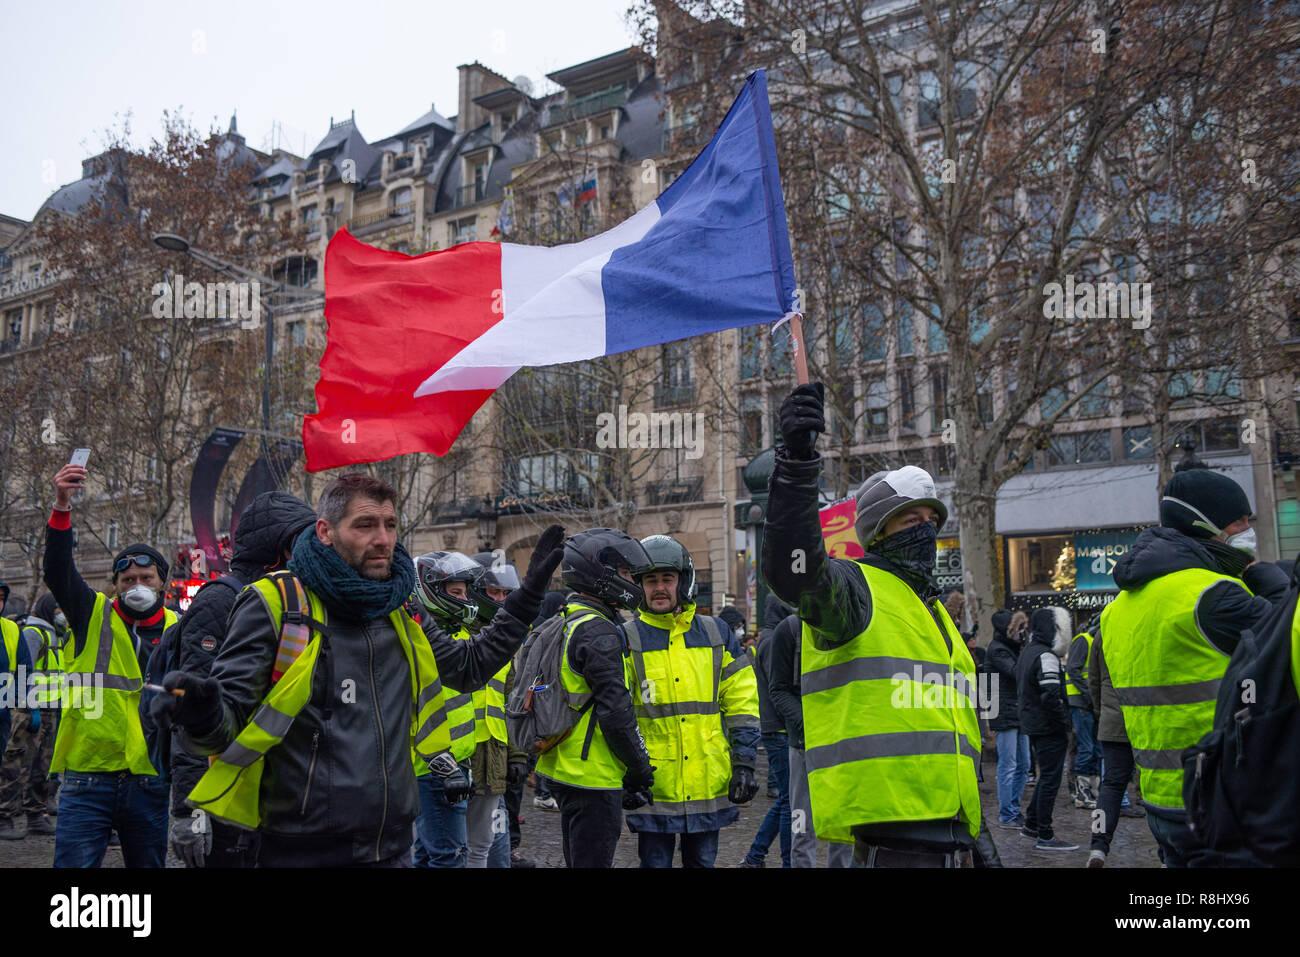 Champs-Elysees, Paris, France. 15th Dec 2018. Protesters waving french flag. Yellow Vests (Gilets Jaunes) protests, Champs-Elysees, Paris, France, DEcember 15, 2018. Credit: Julien Garnier/Alamy Live News - Stock Image